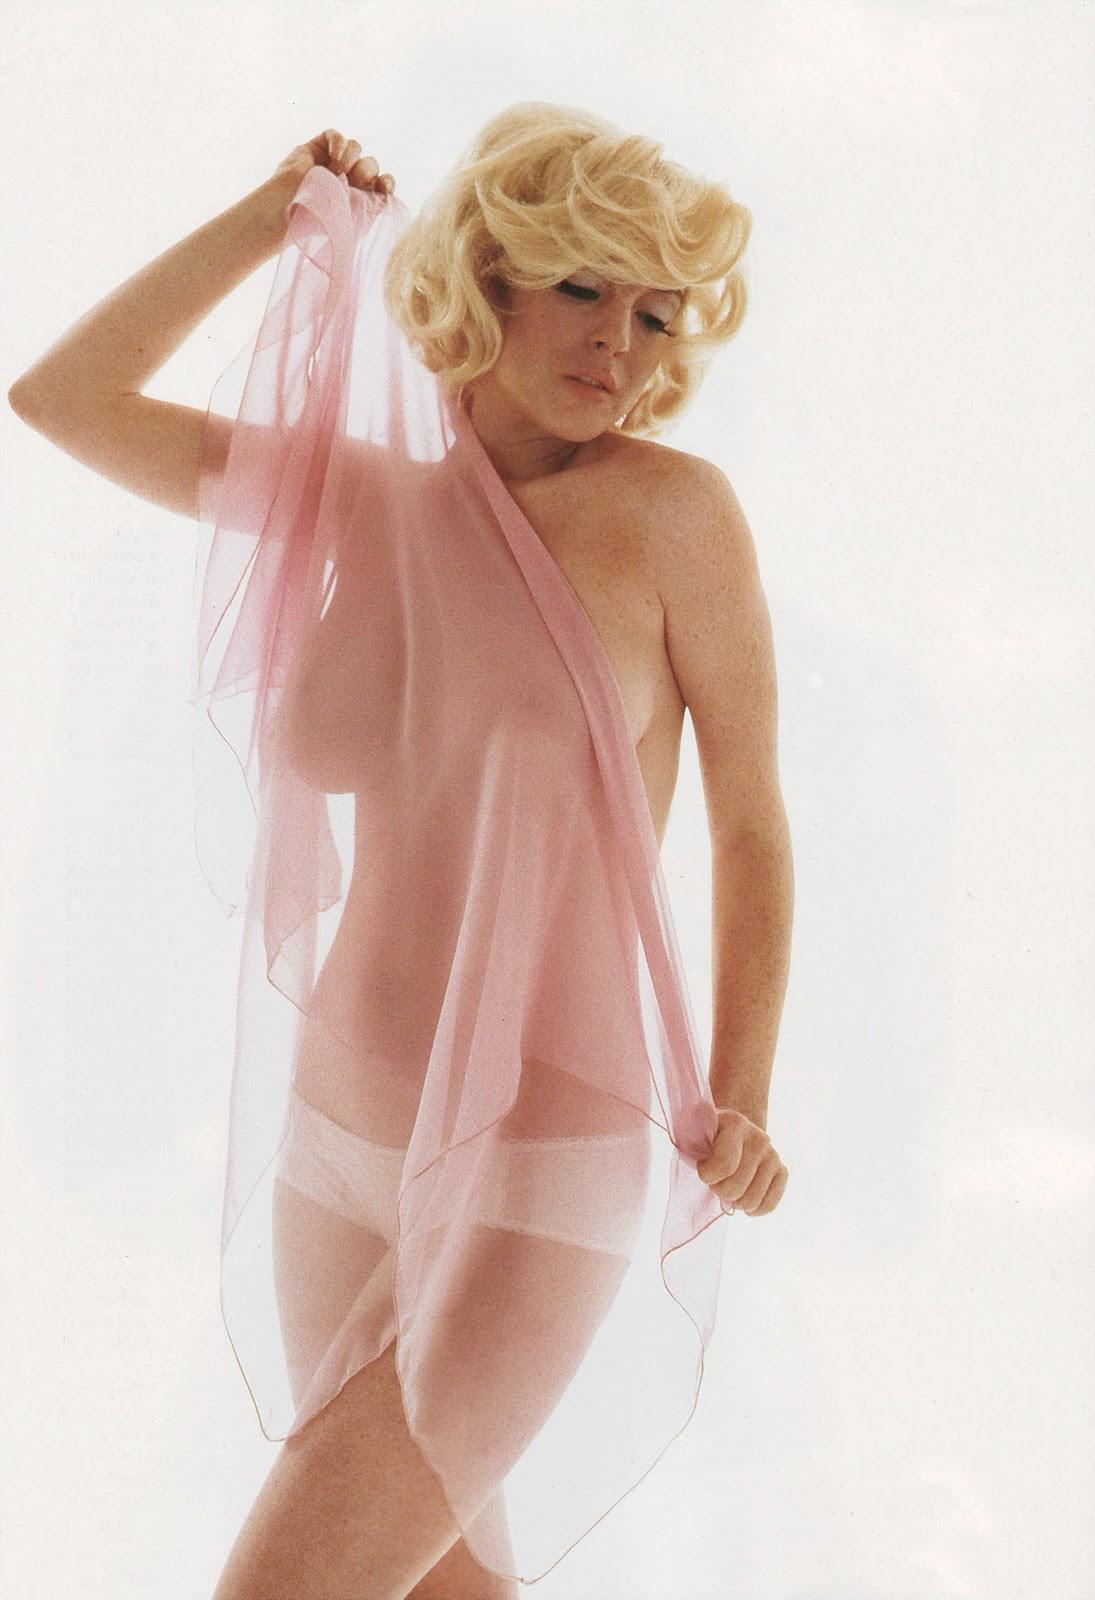 http://1.bp.blogspot.com/-Vc5X5uRvl3A/TwXZUa3ocGI/AAAAAAAAAtI/DaRbsP6ZDVs/s1600/Lindsay-Lohan-Nude-playboy%255Bwww.veniceracket.com%255D.jpg